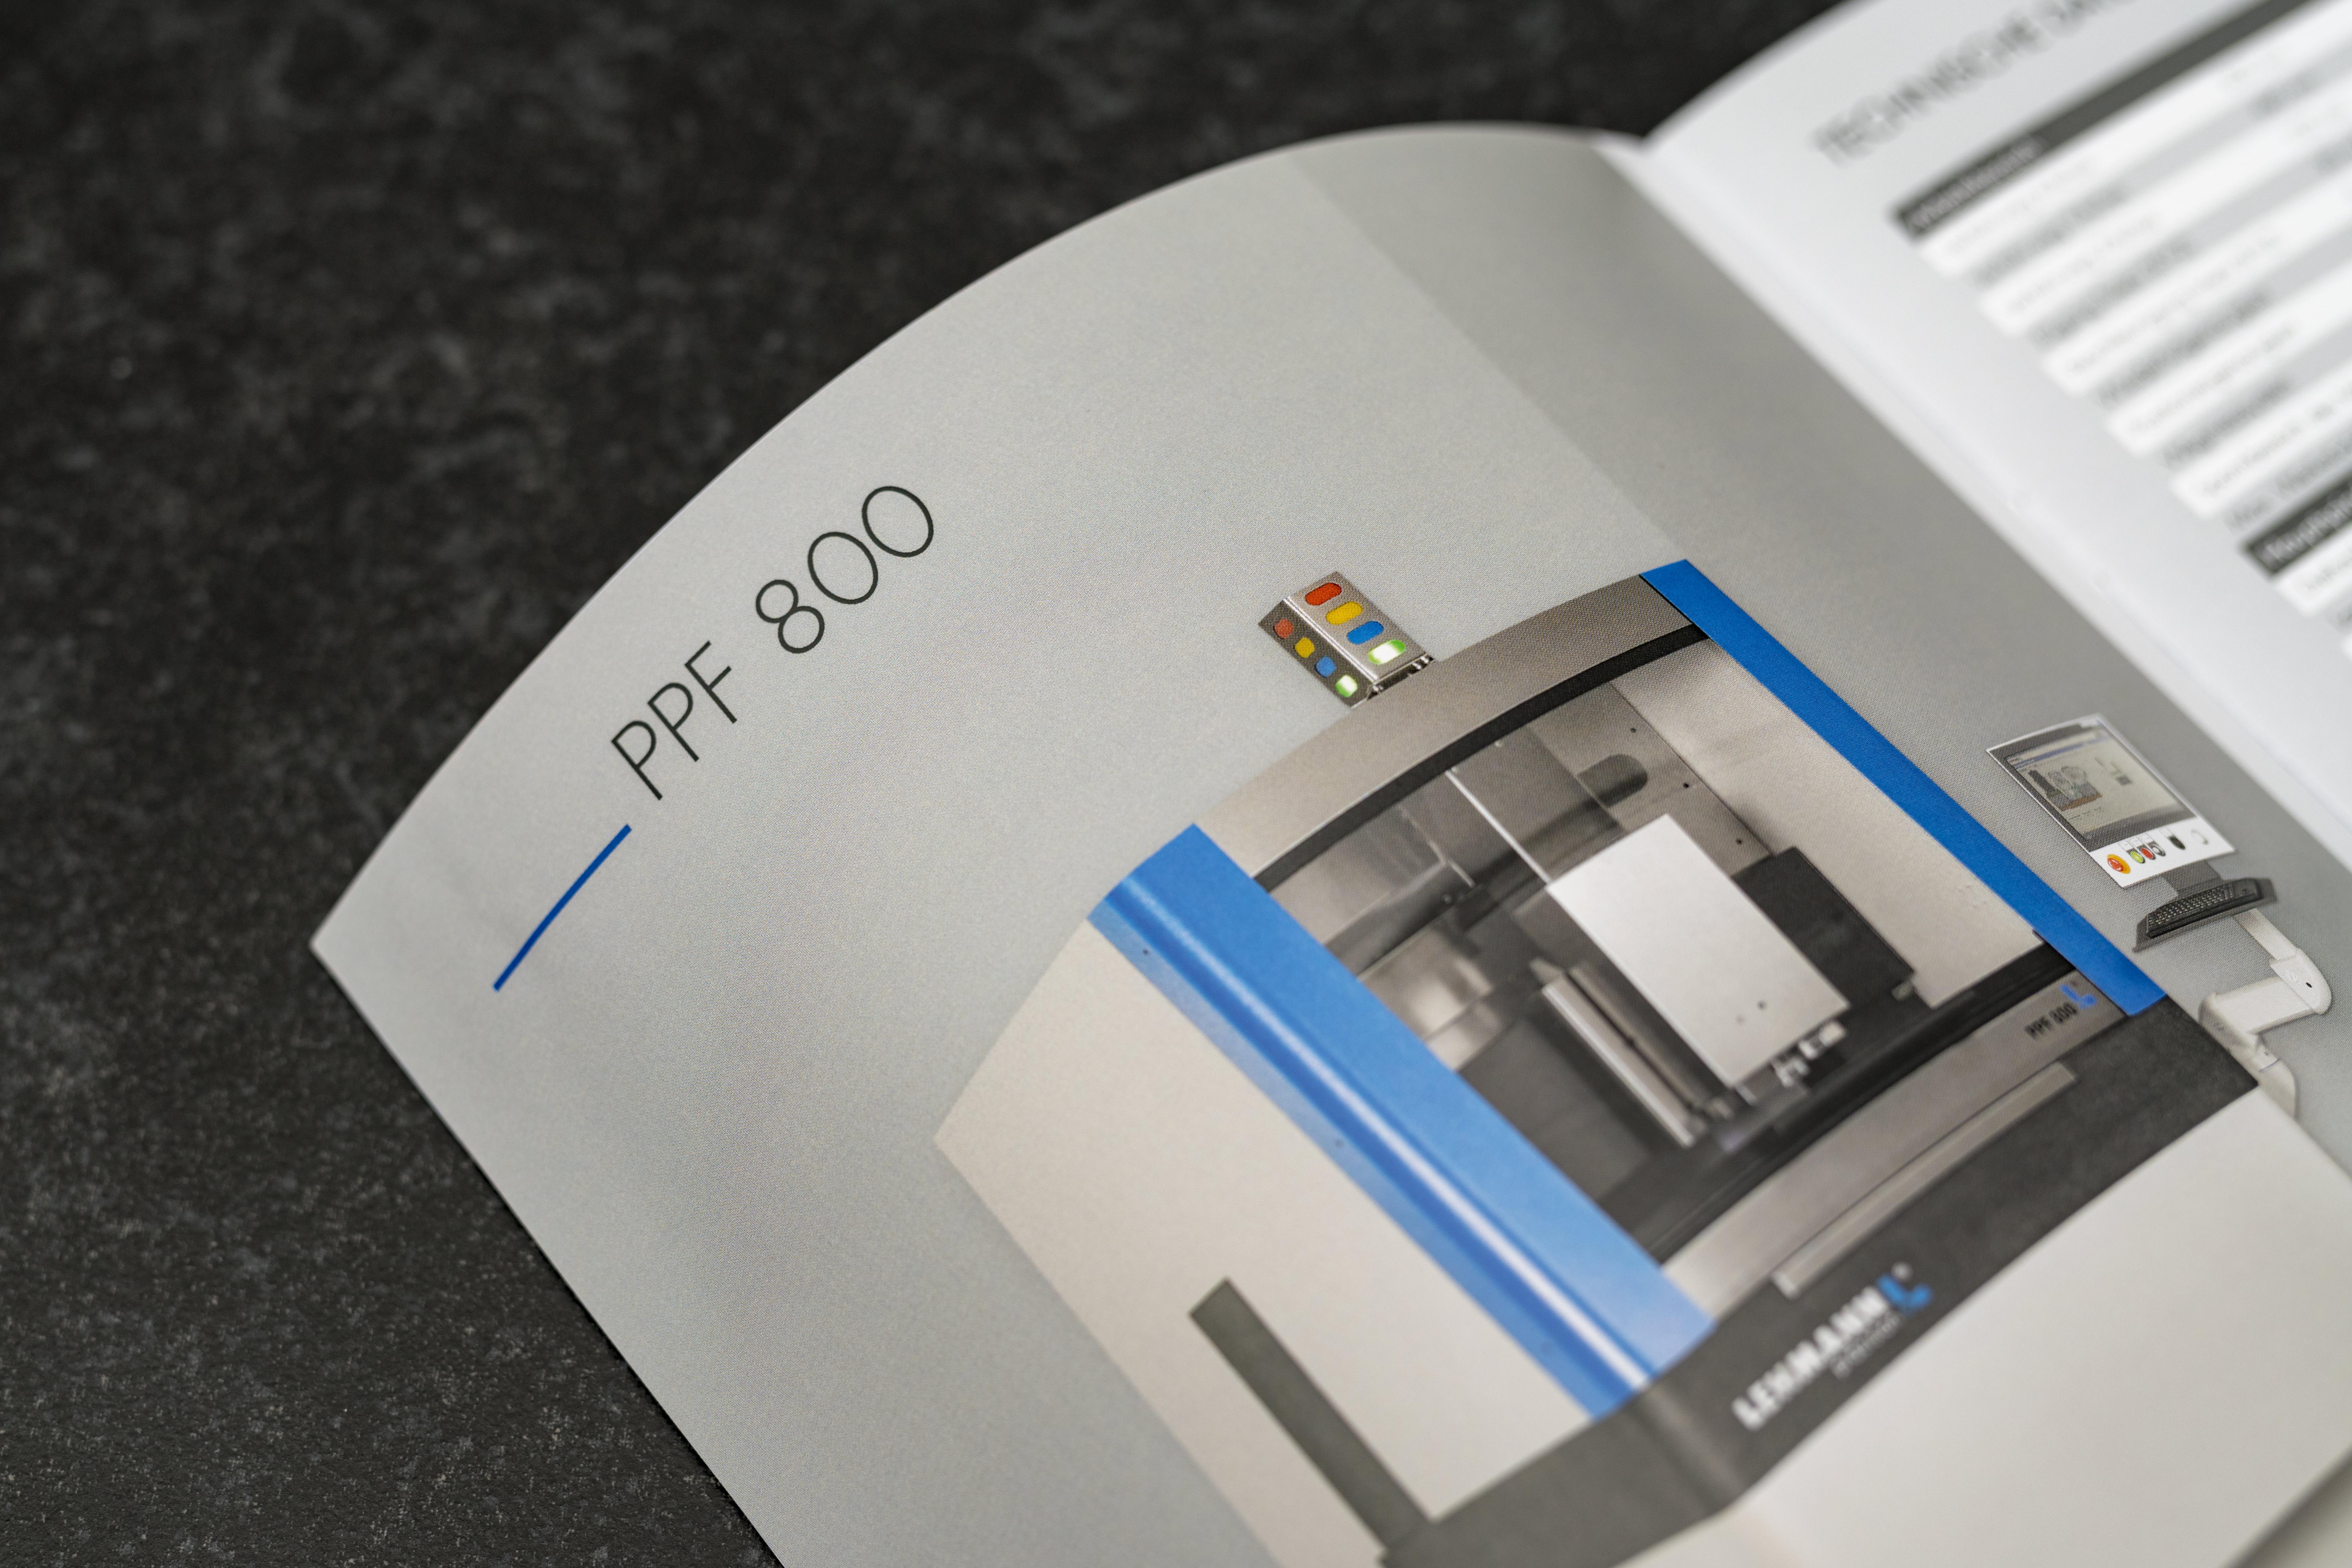 sptmbr-lehmann-broschuere-ppf-800